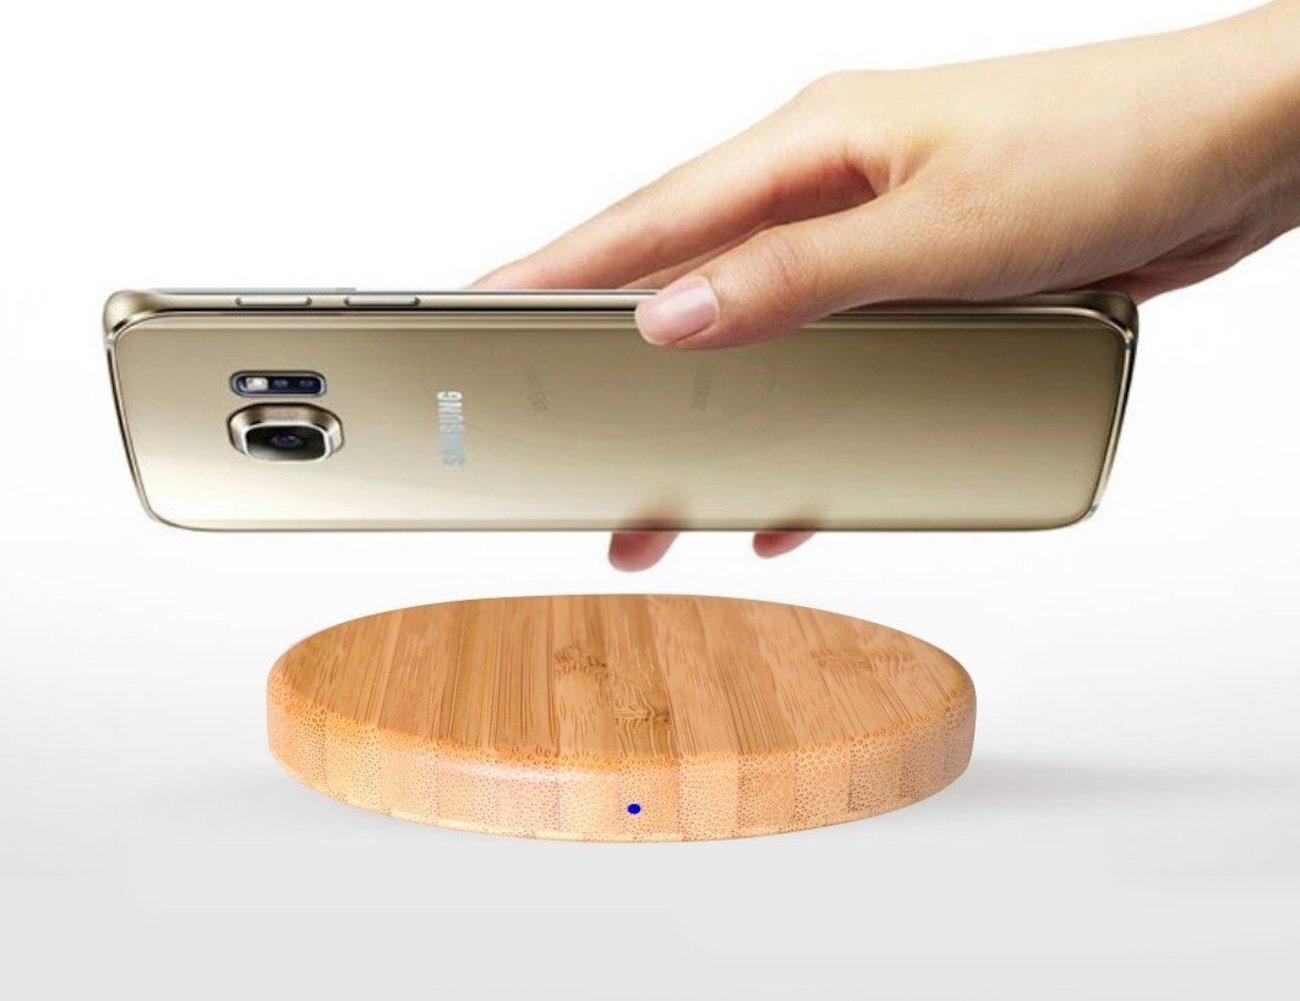 Qivv Wooden Wireless Smartphone Charger